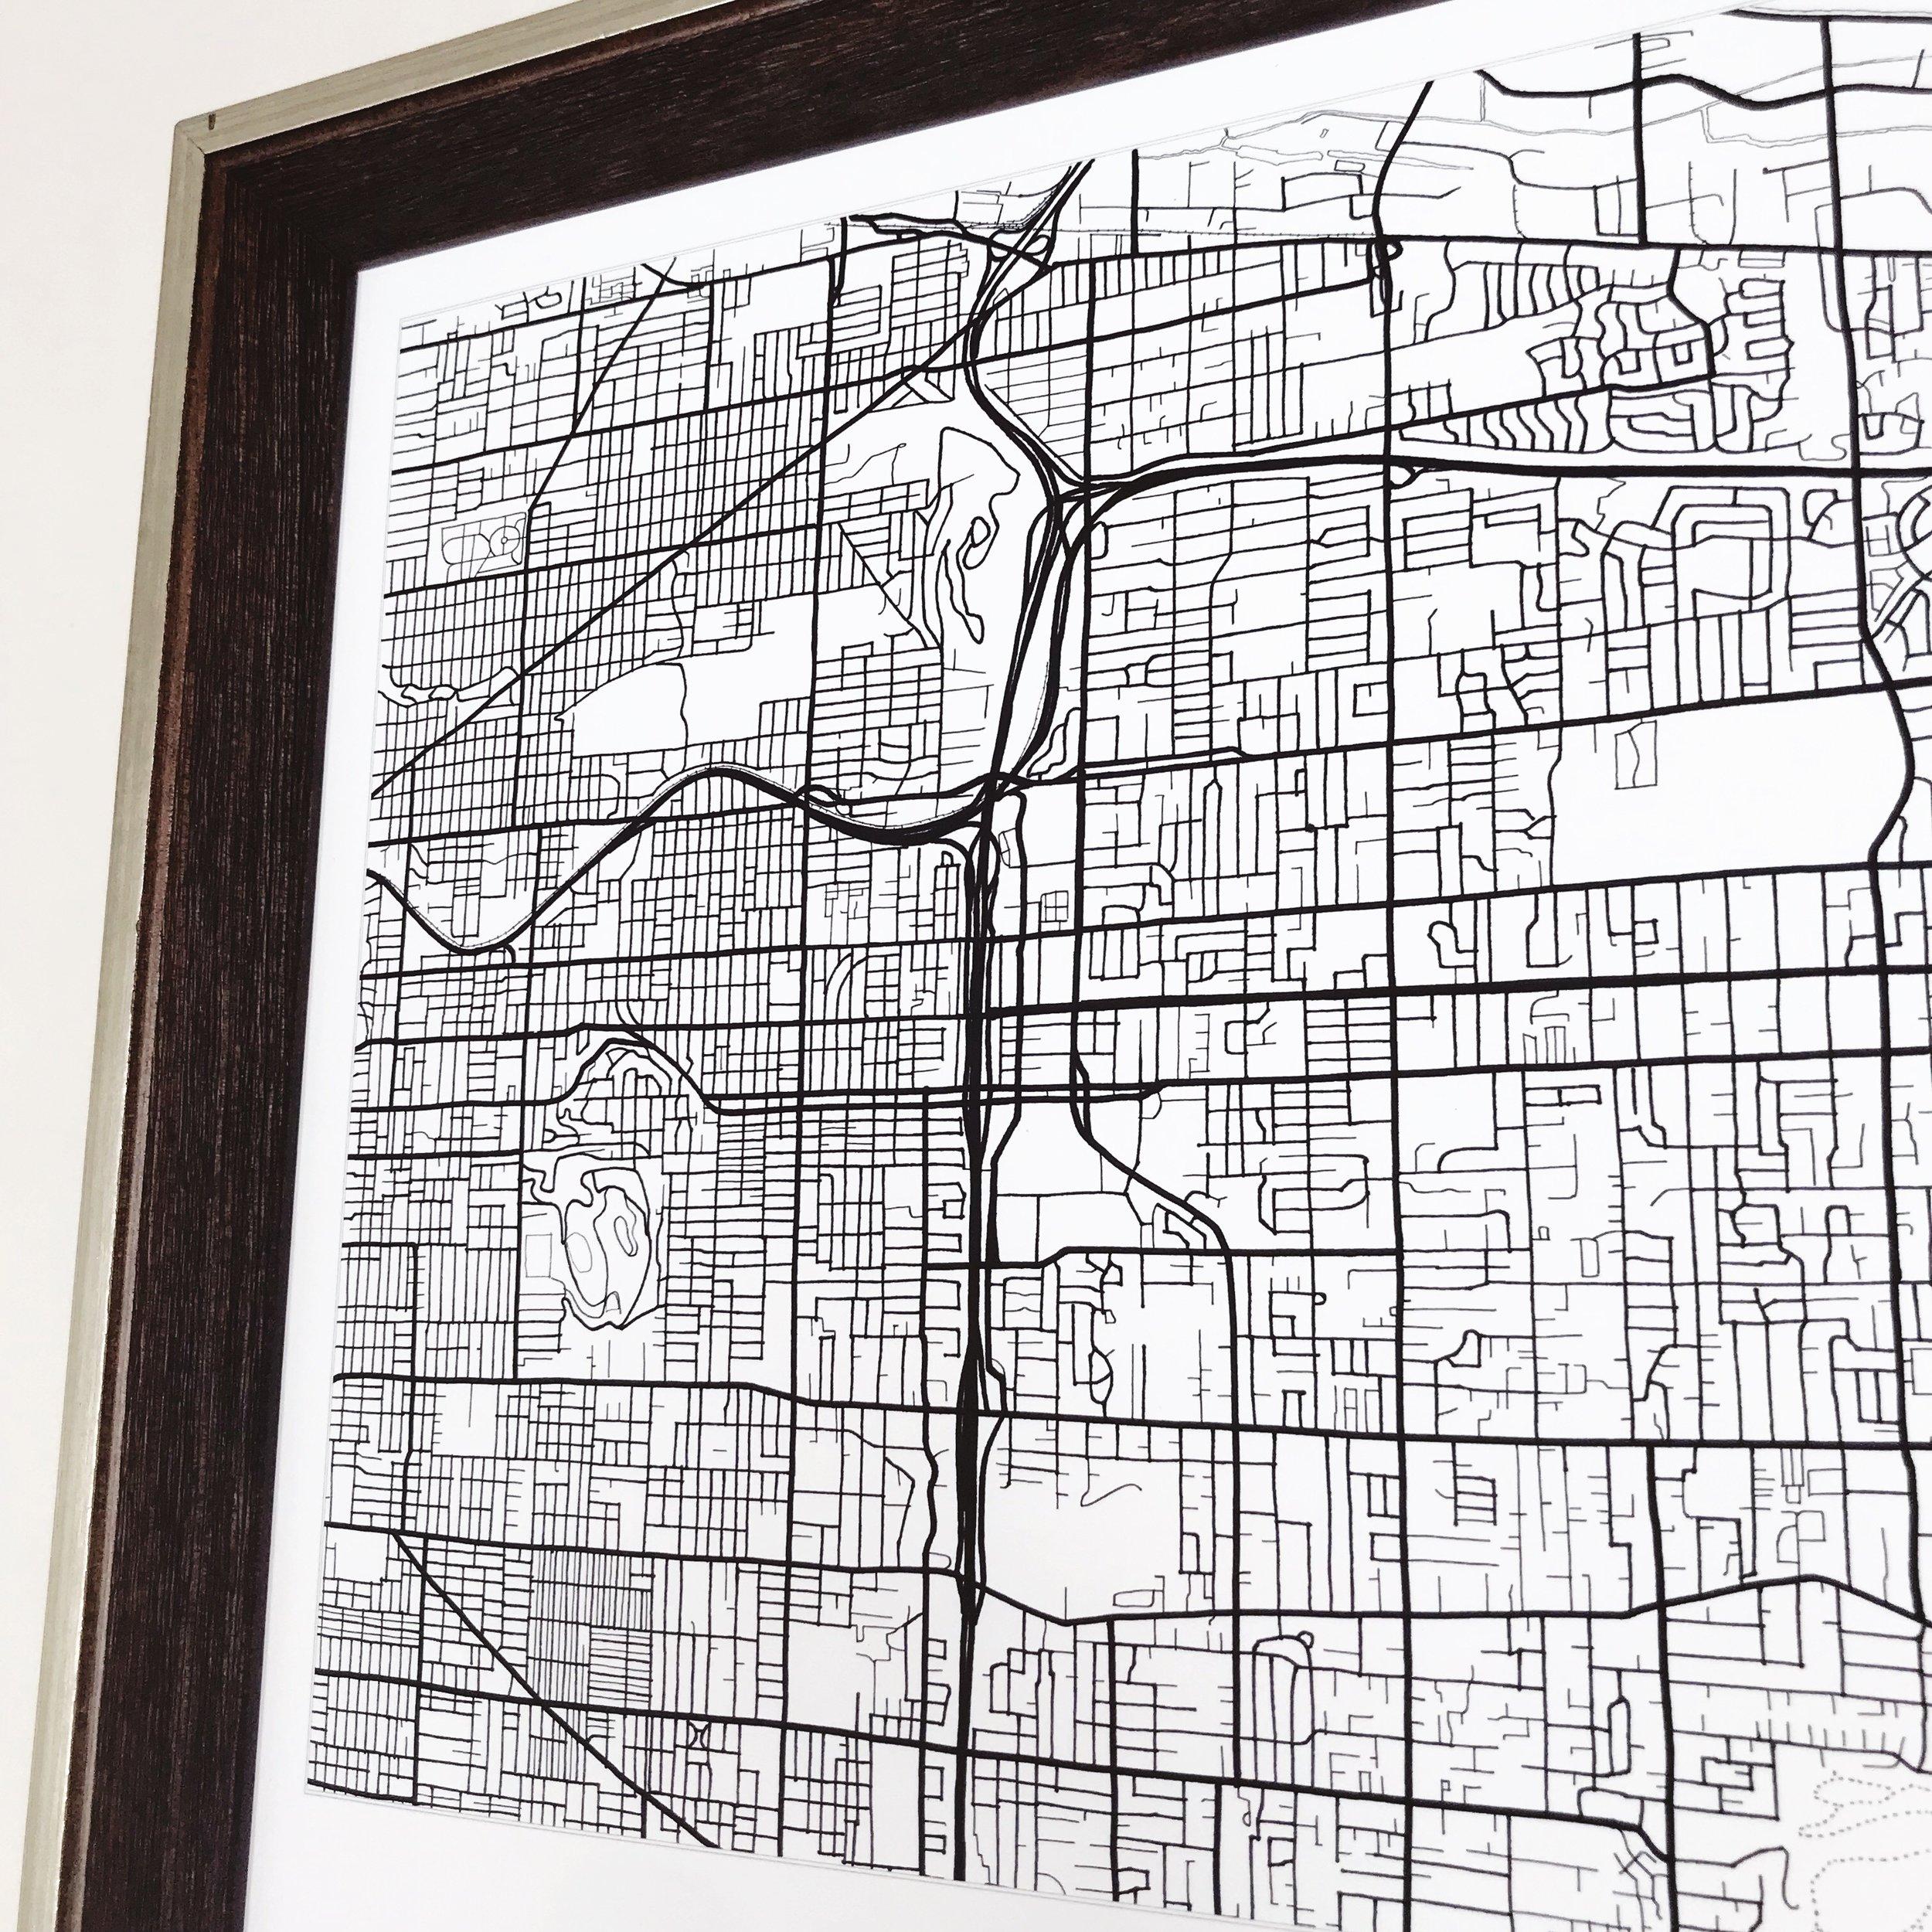 Montavilla neighborhood map